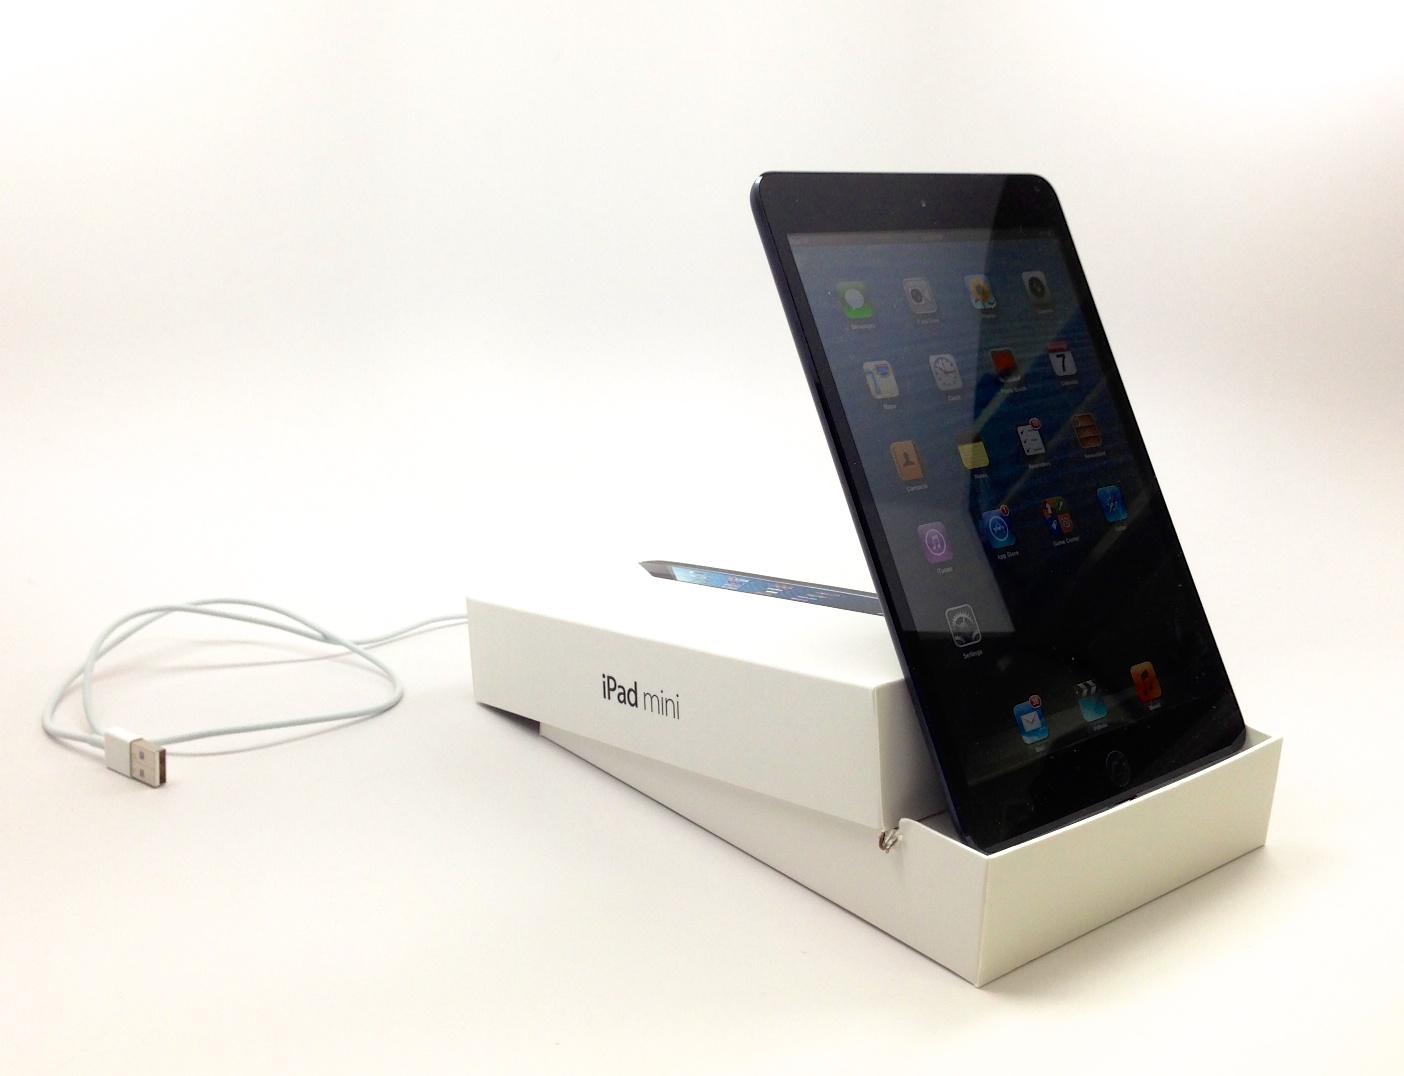 ipad-mini-stand-dock-apple 3